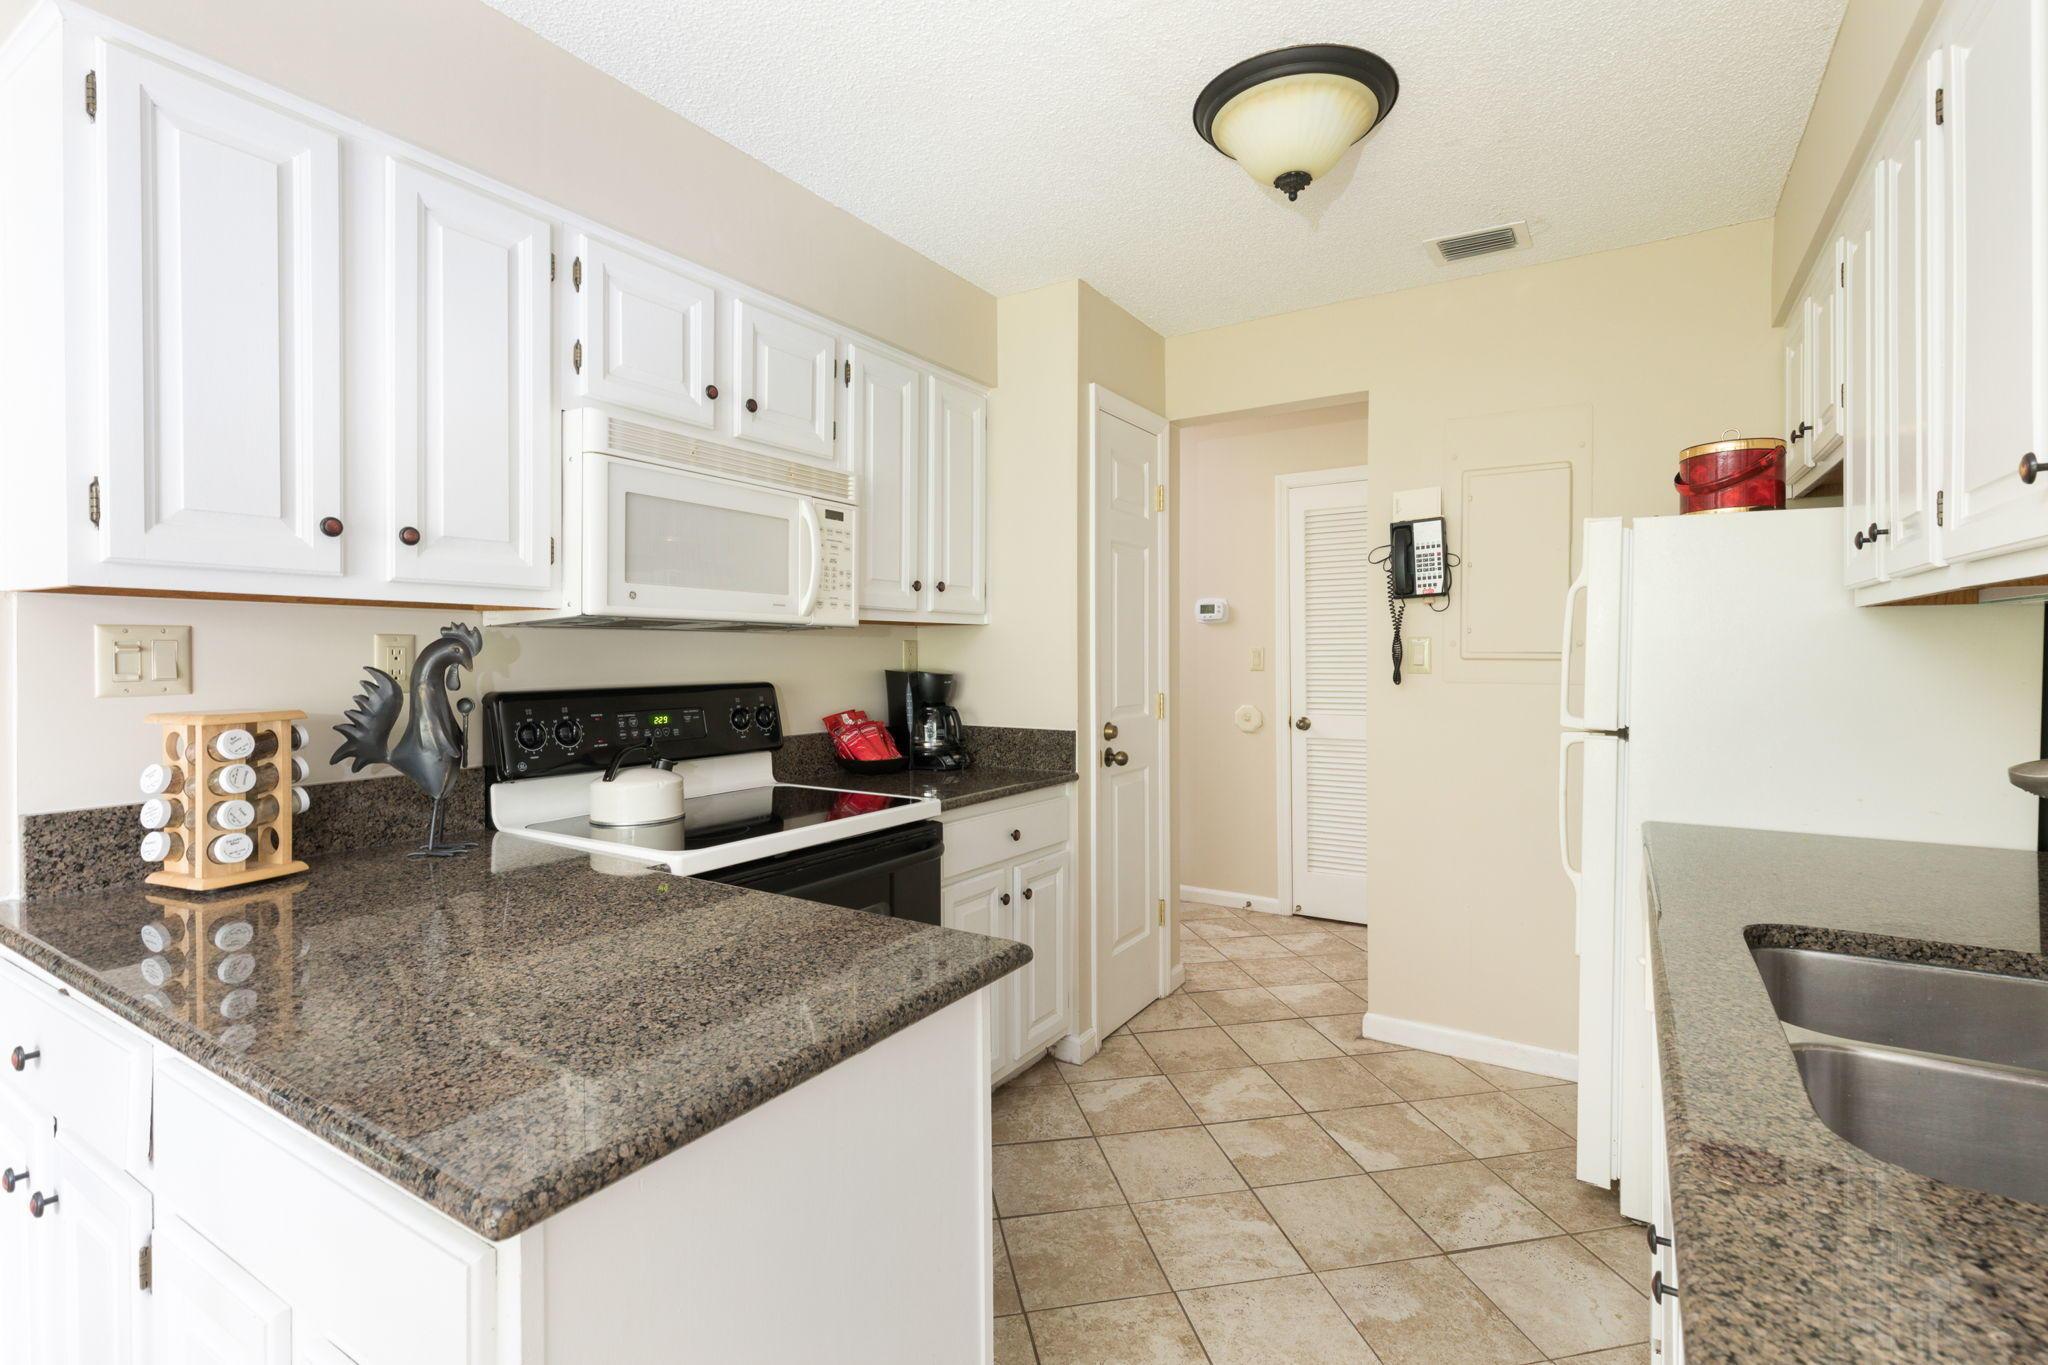 Kiawah Island Homes For Sale - 5534 Green Dolphin, Kiawah Island, SC - 47